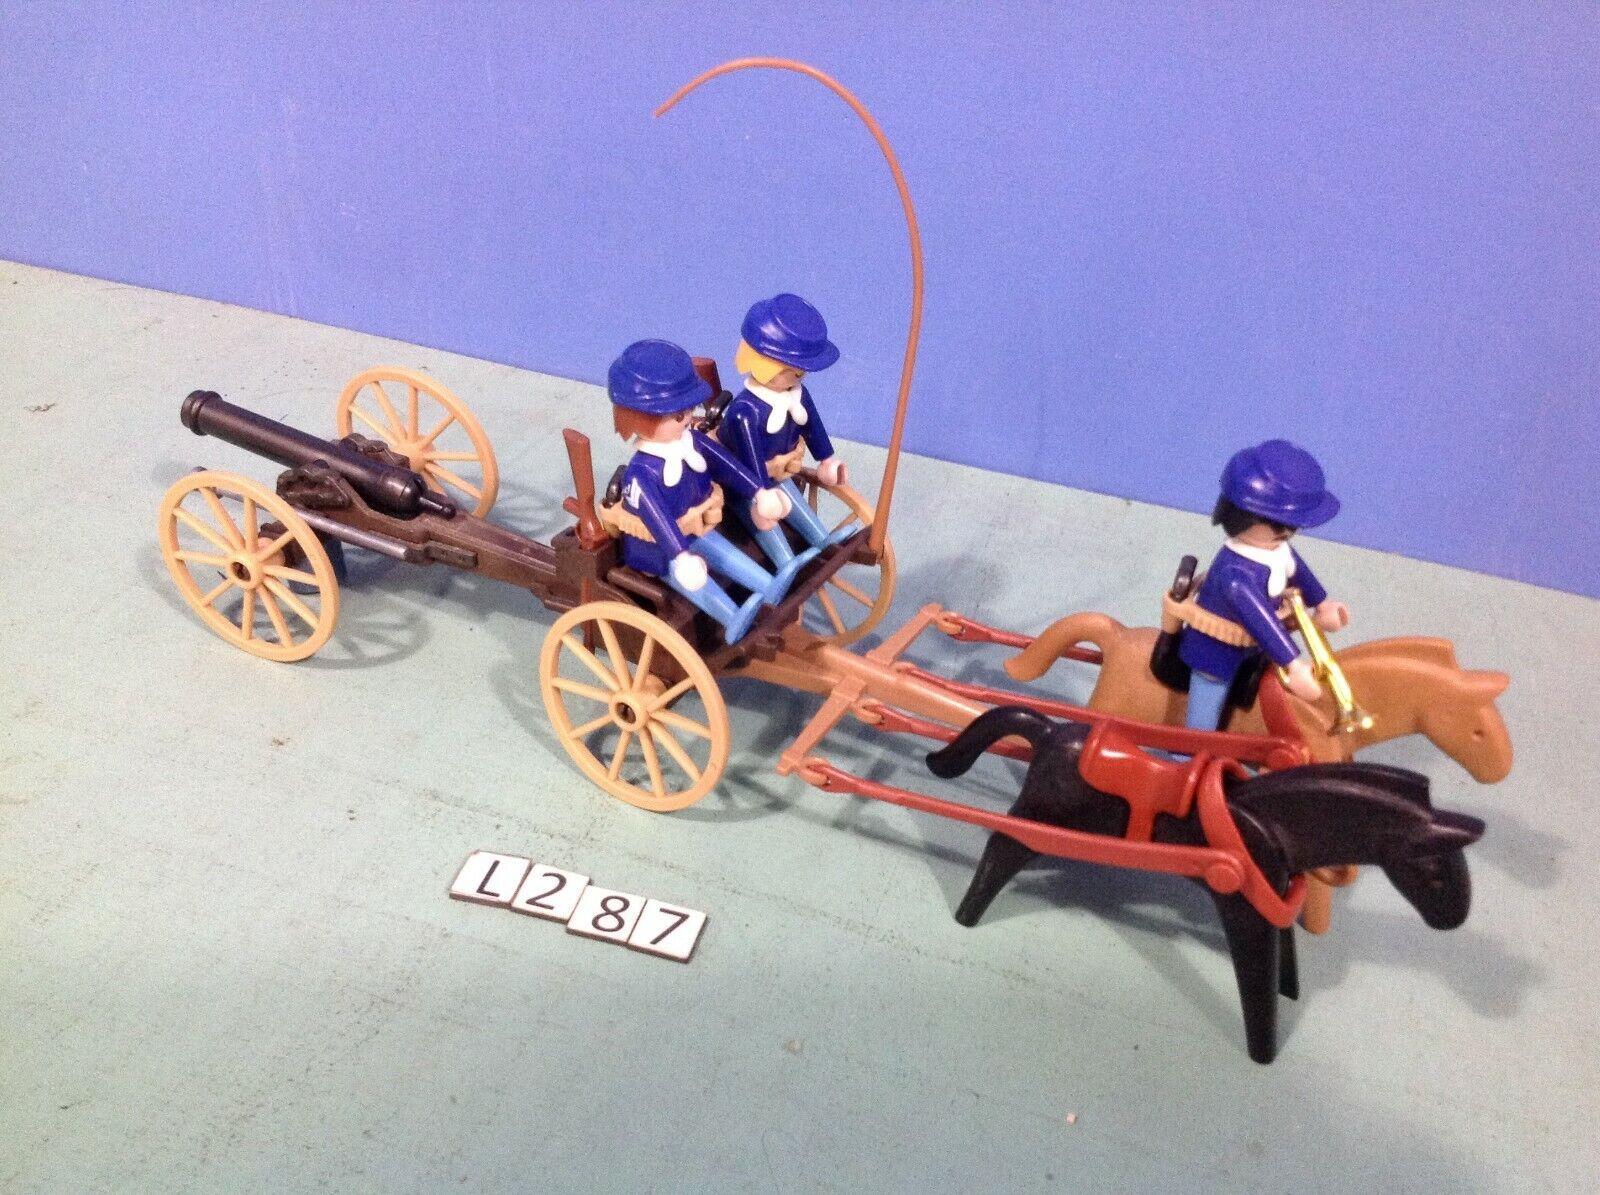 (L287) playmobil Chariot canon Nordistes ref 3729 western Sudistes 3806 5245